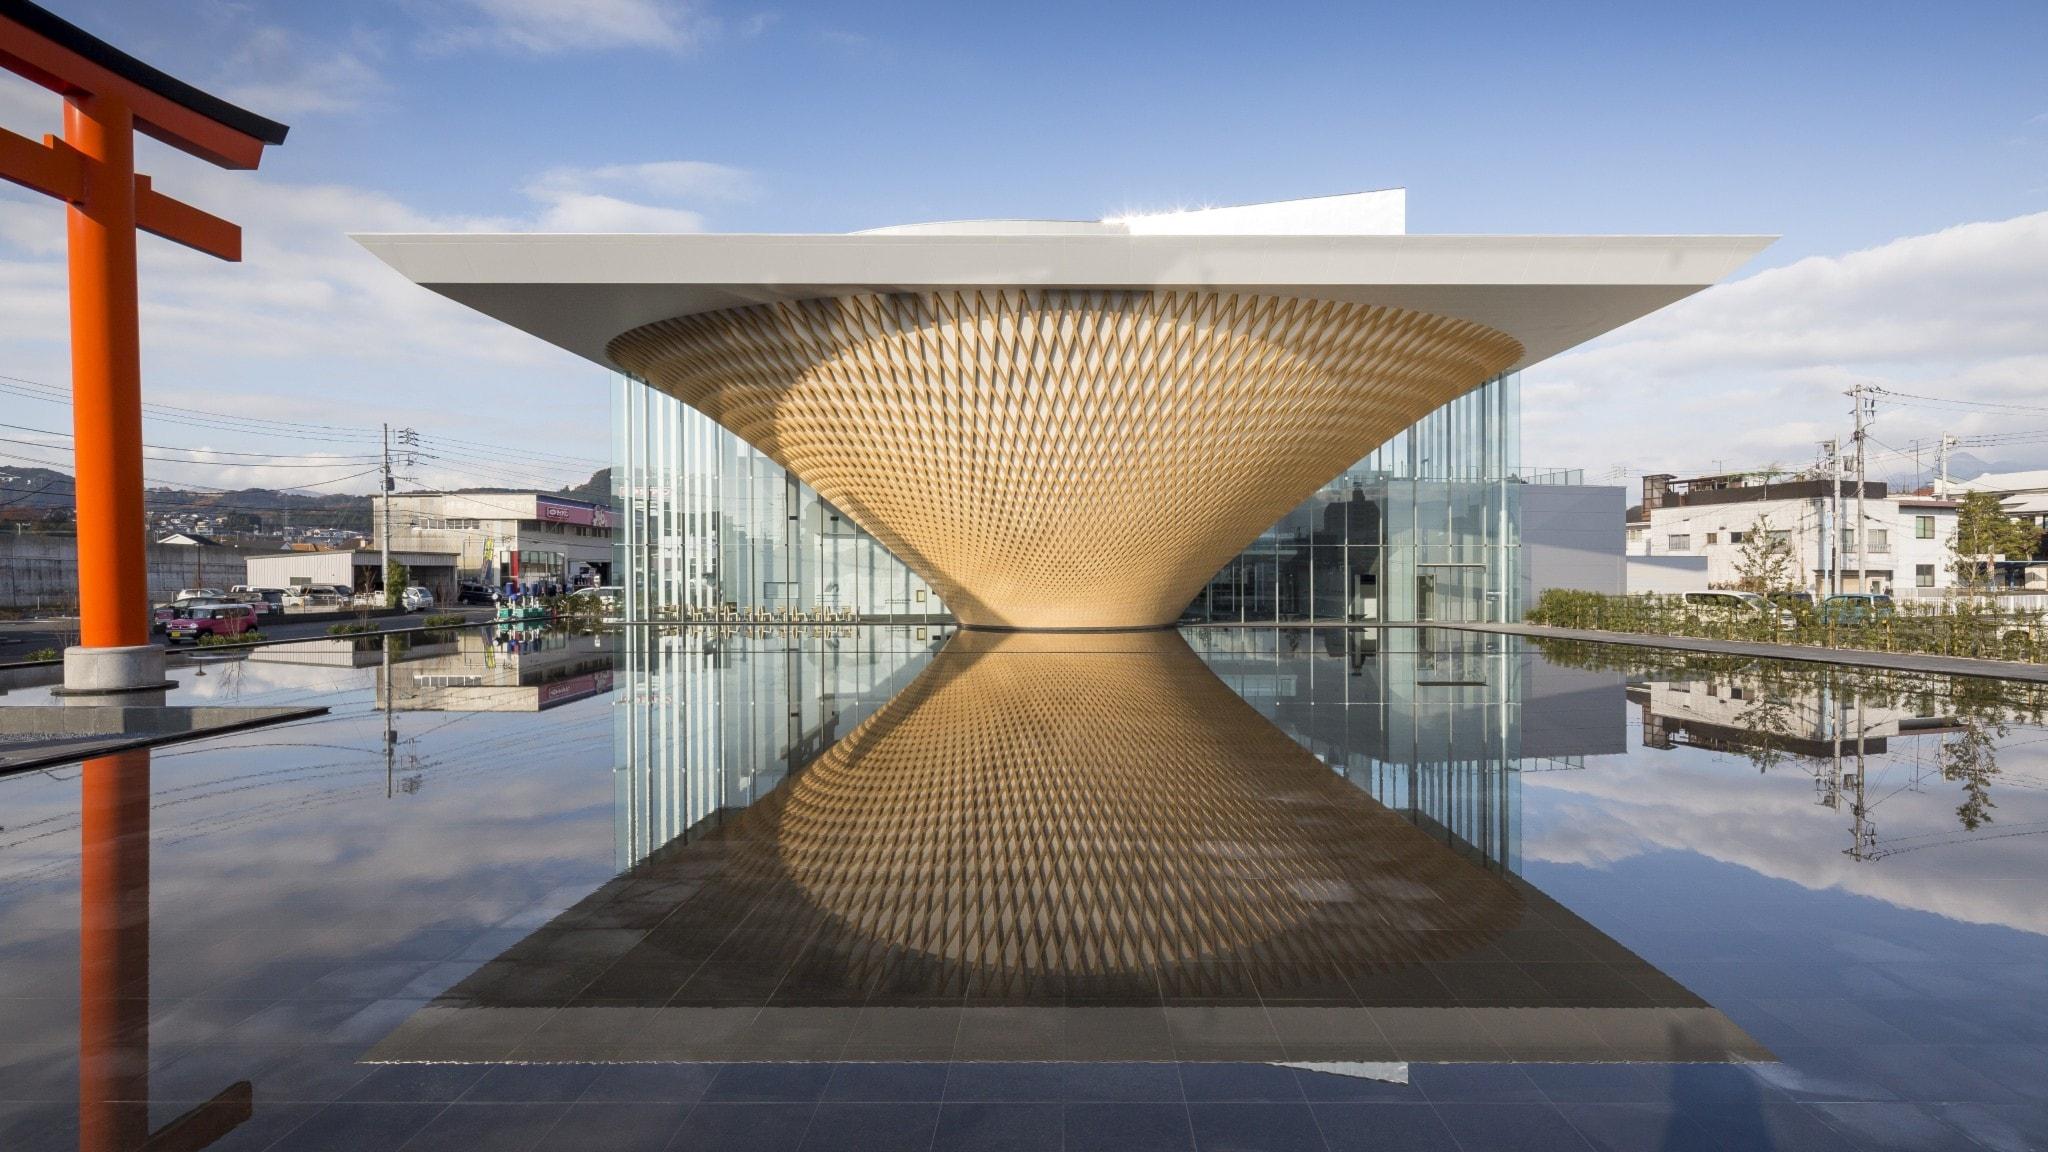 Fuji World Heritage Center av arkitekten Shigeru Ban